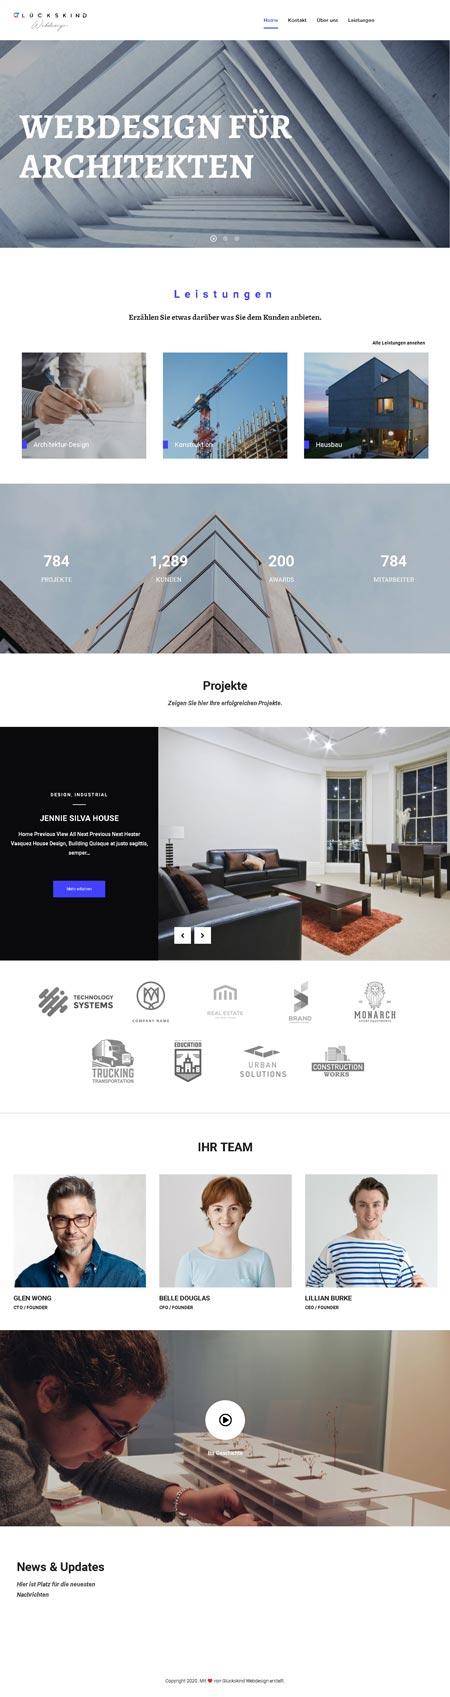 Architekt Foster - Glückskind Webdesign Musterkatalog